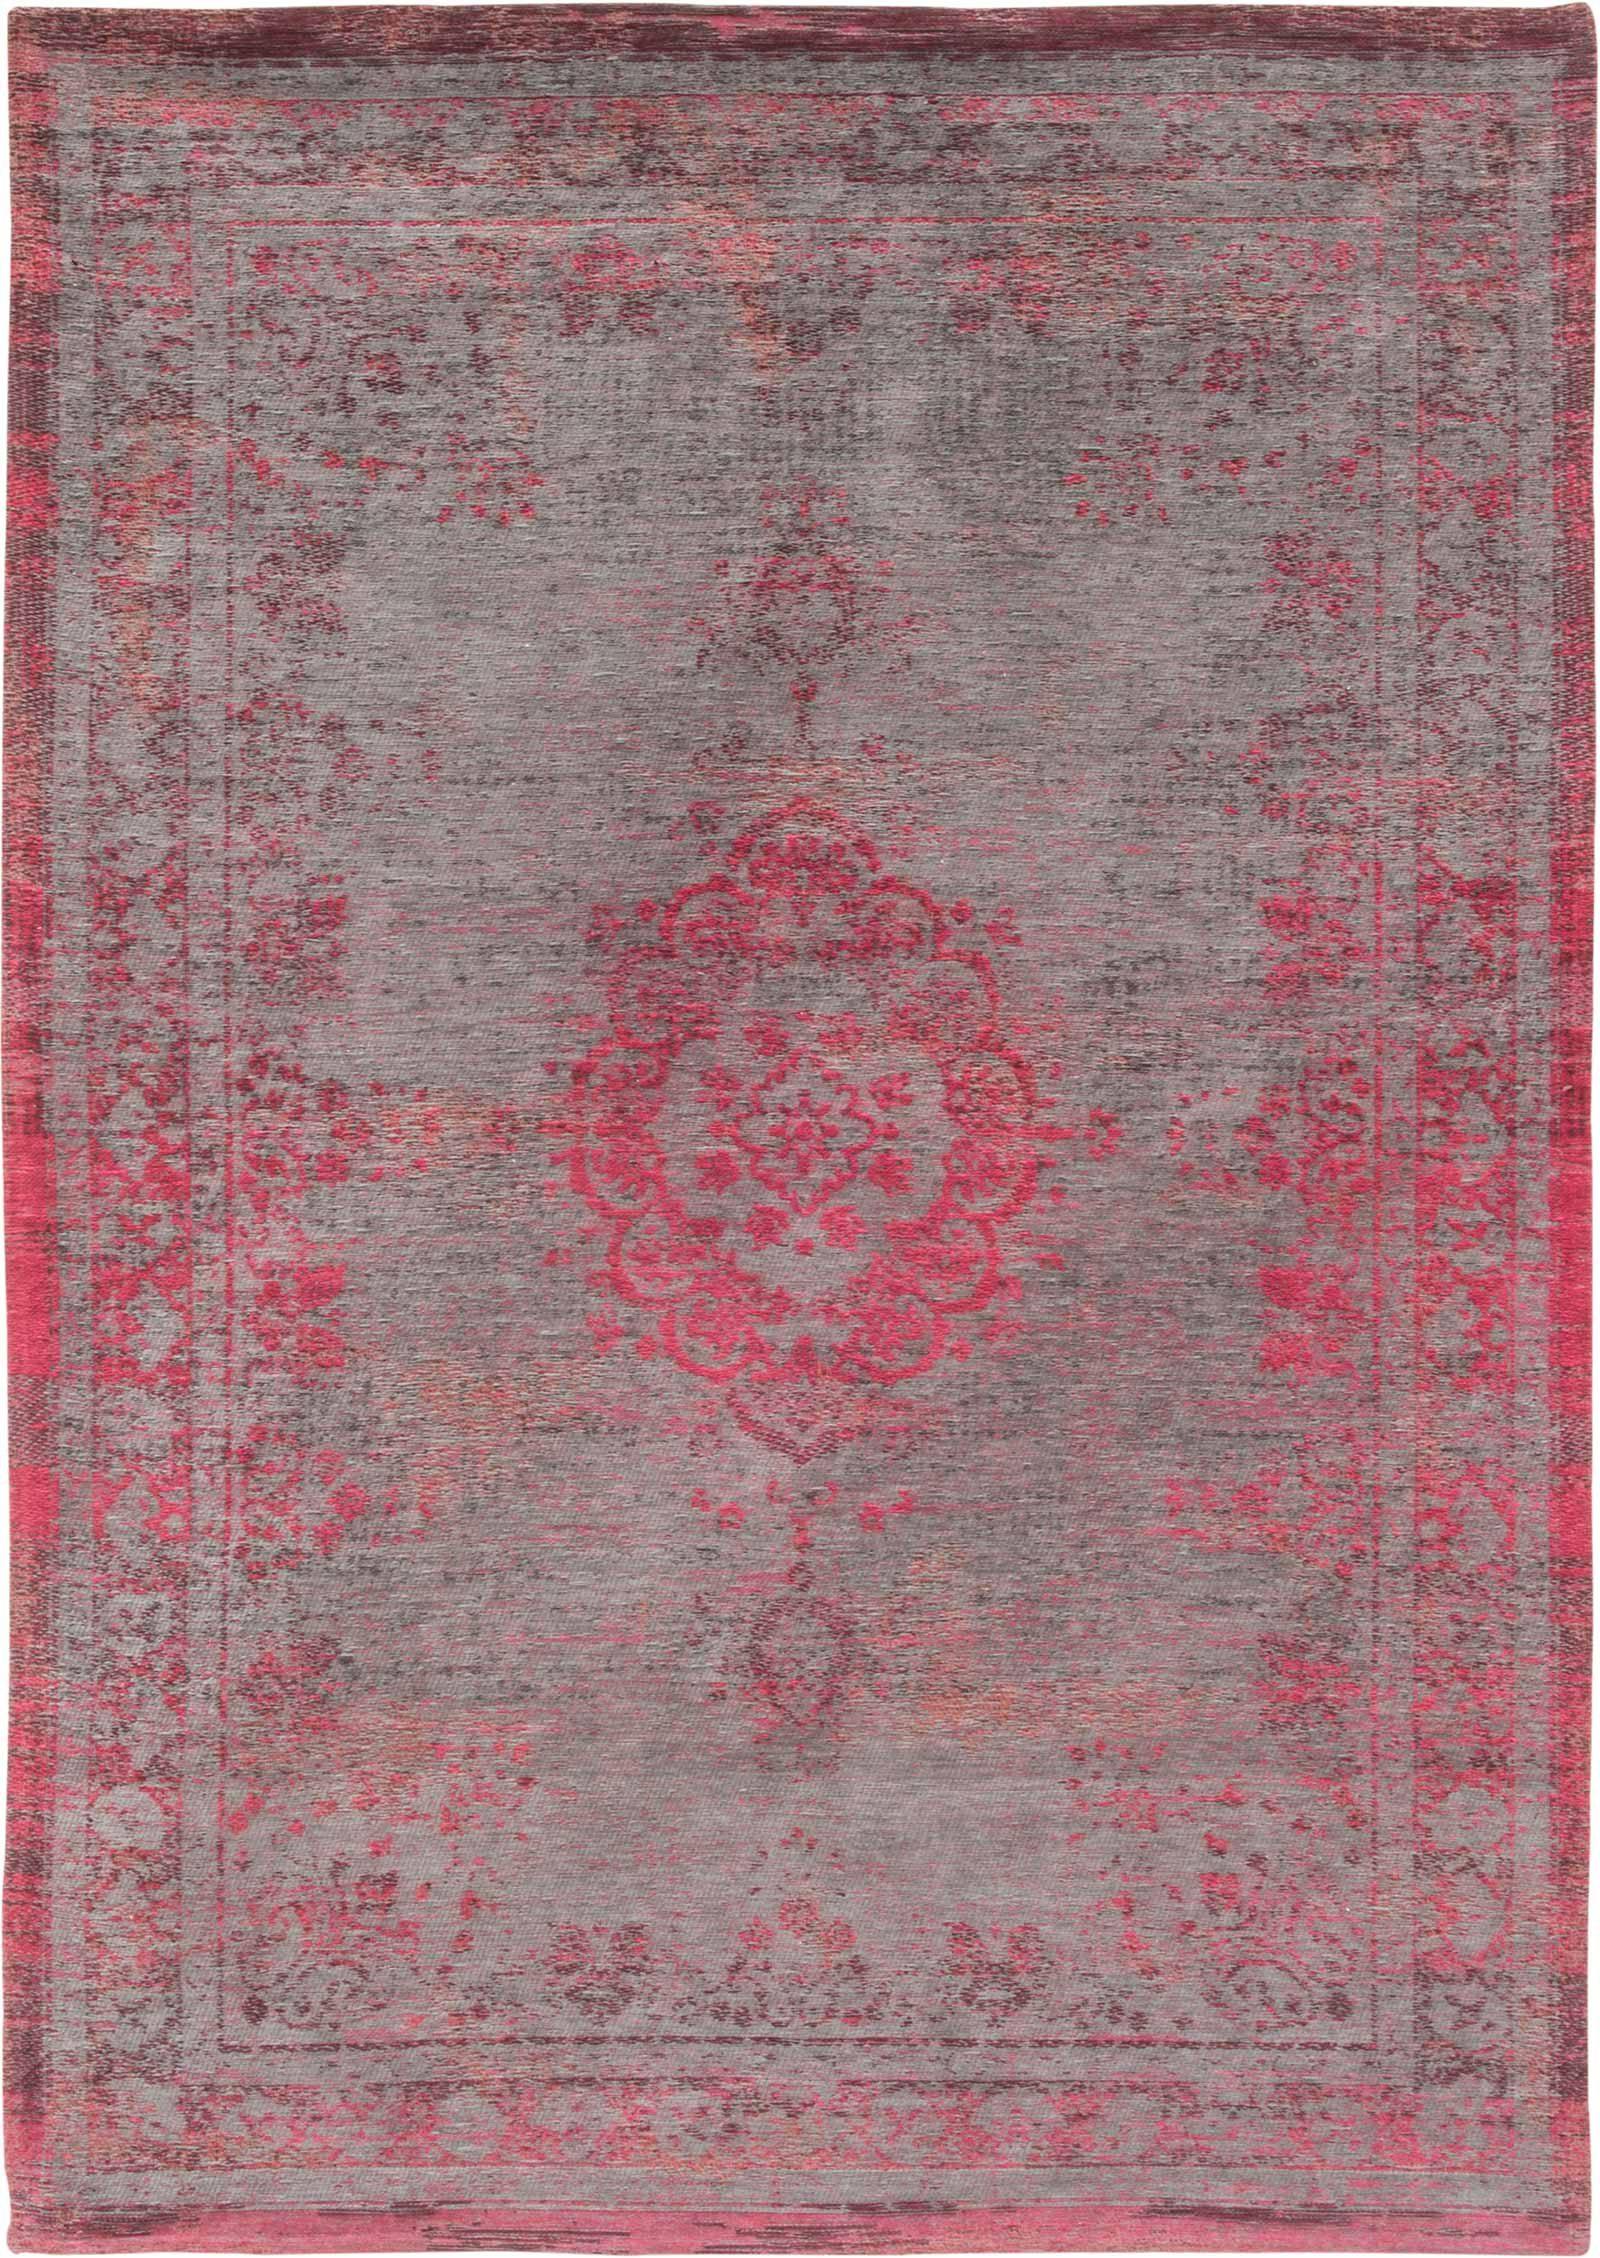 tapijt Louis De Poortere LX8261 Fading World Medaillon Pink Flash